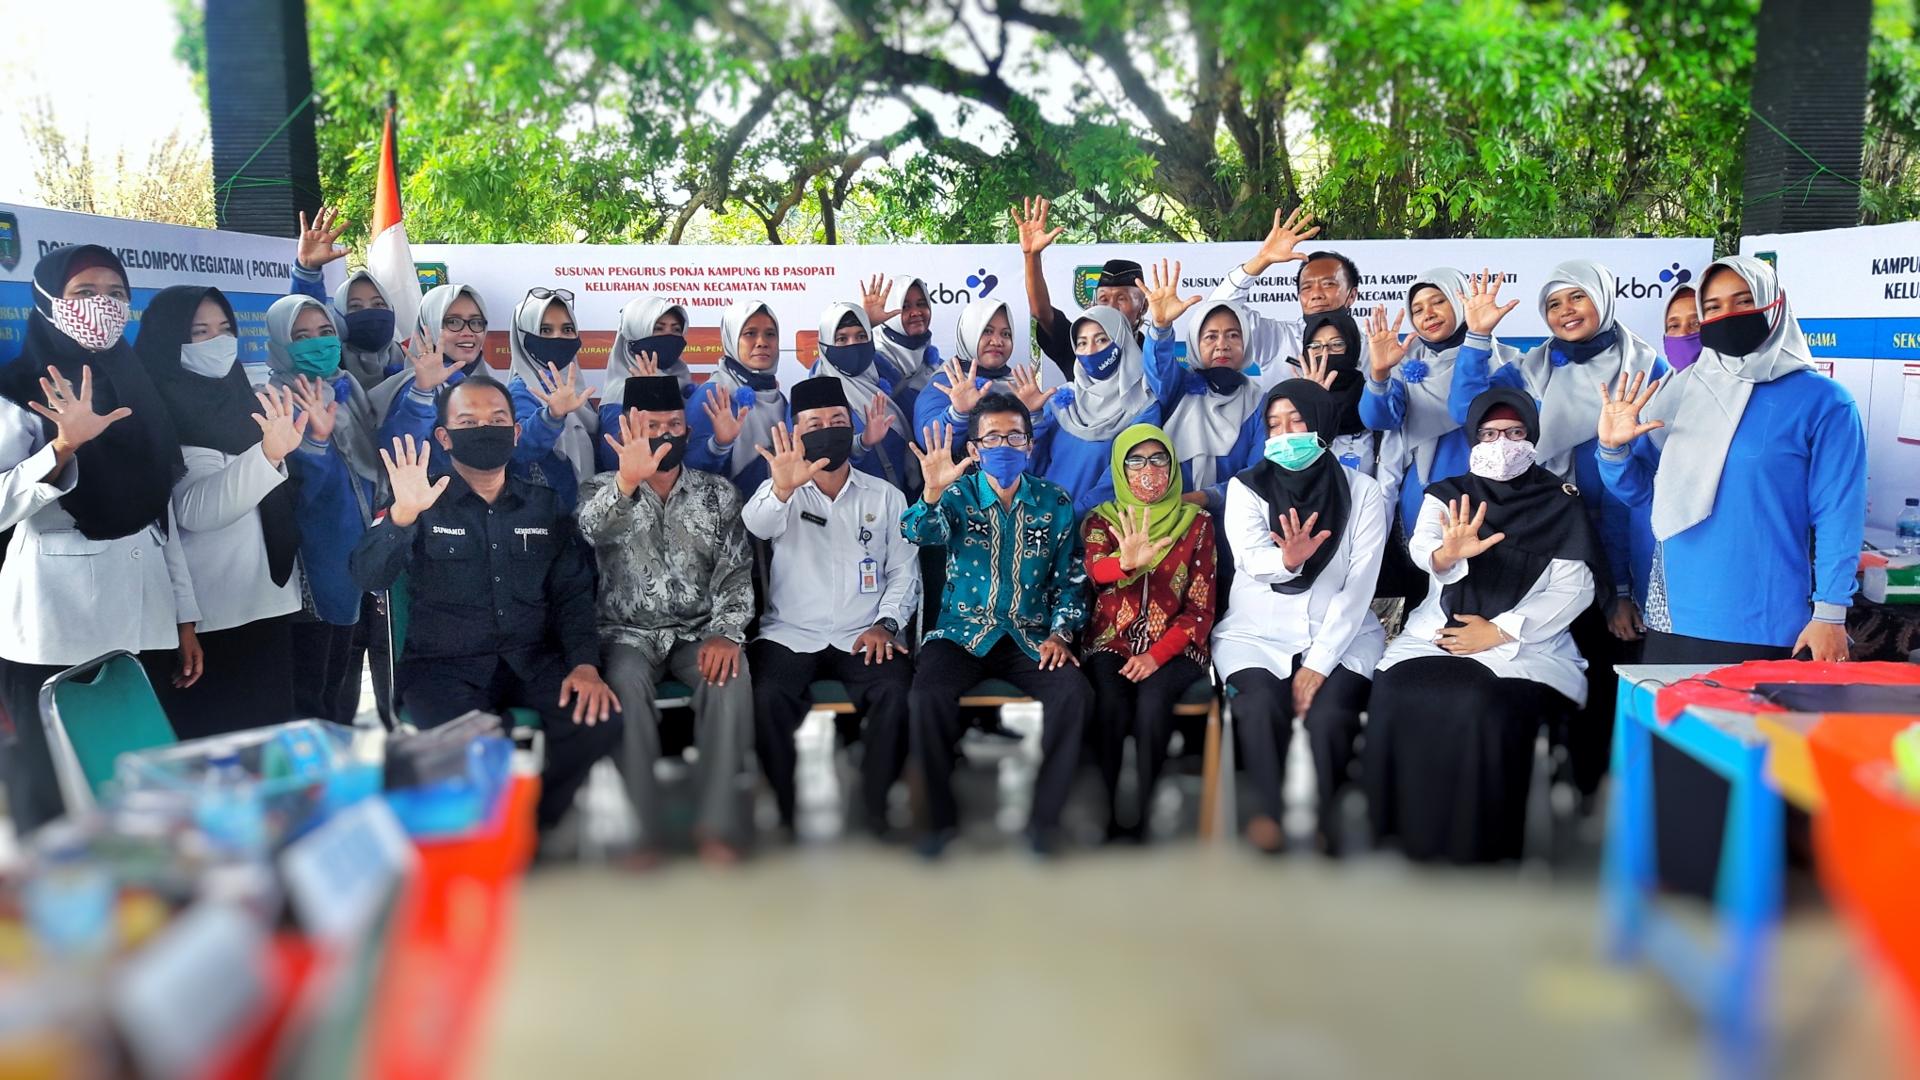 Lomba Kampung KB Tingkat Kota Tahun 2020 Di Kelurahan Josenan